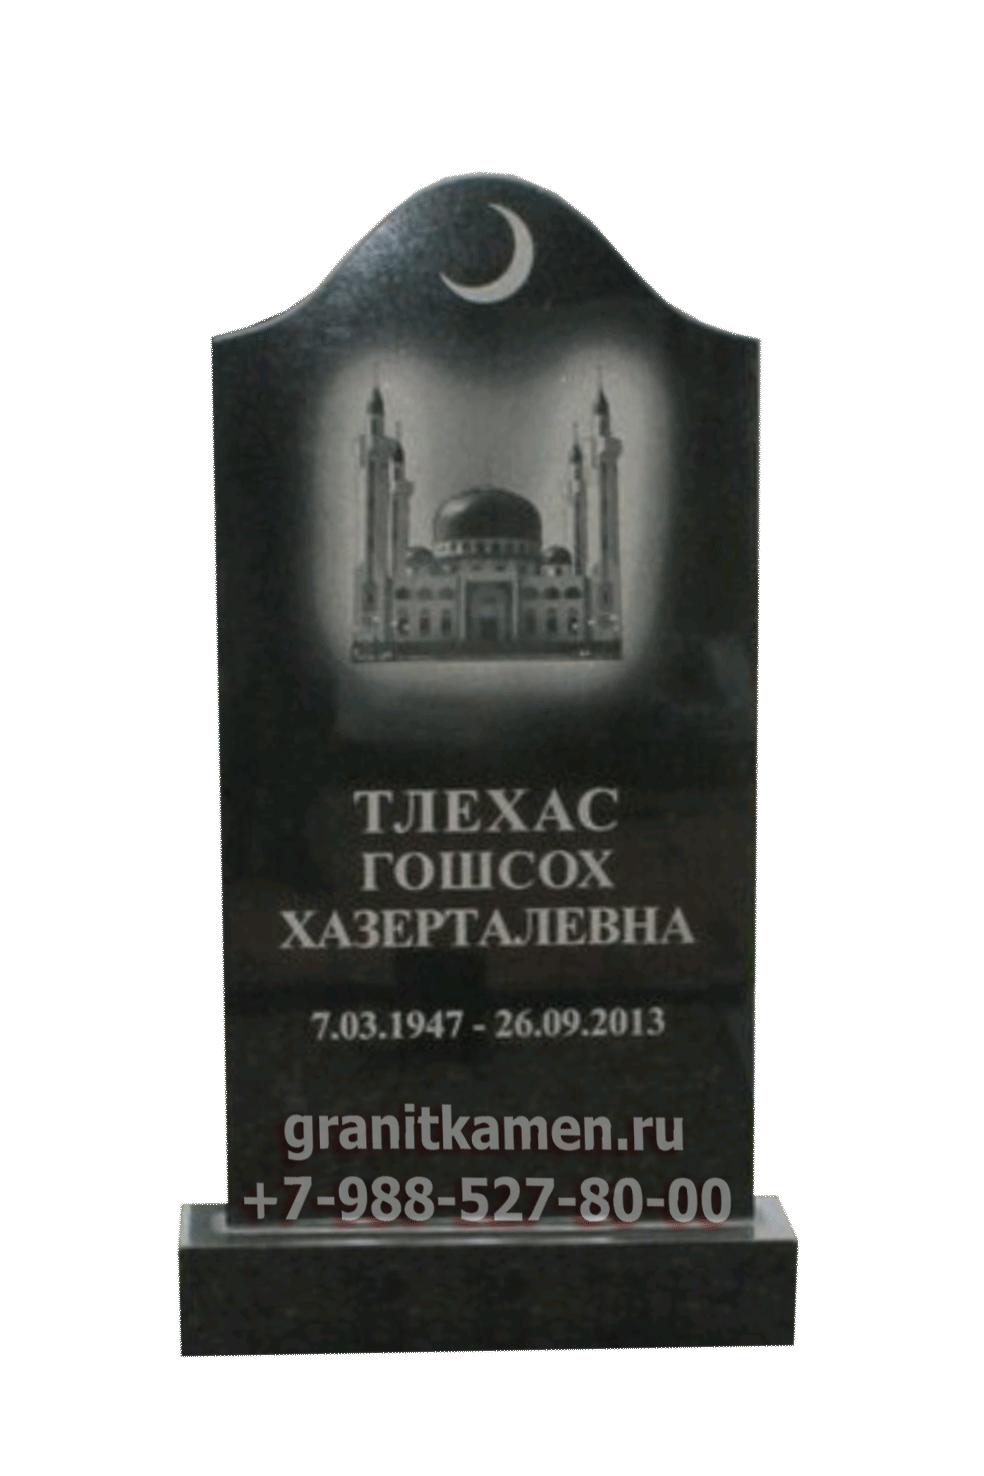 granit_firmen_katalog_060